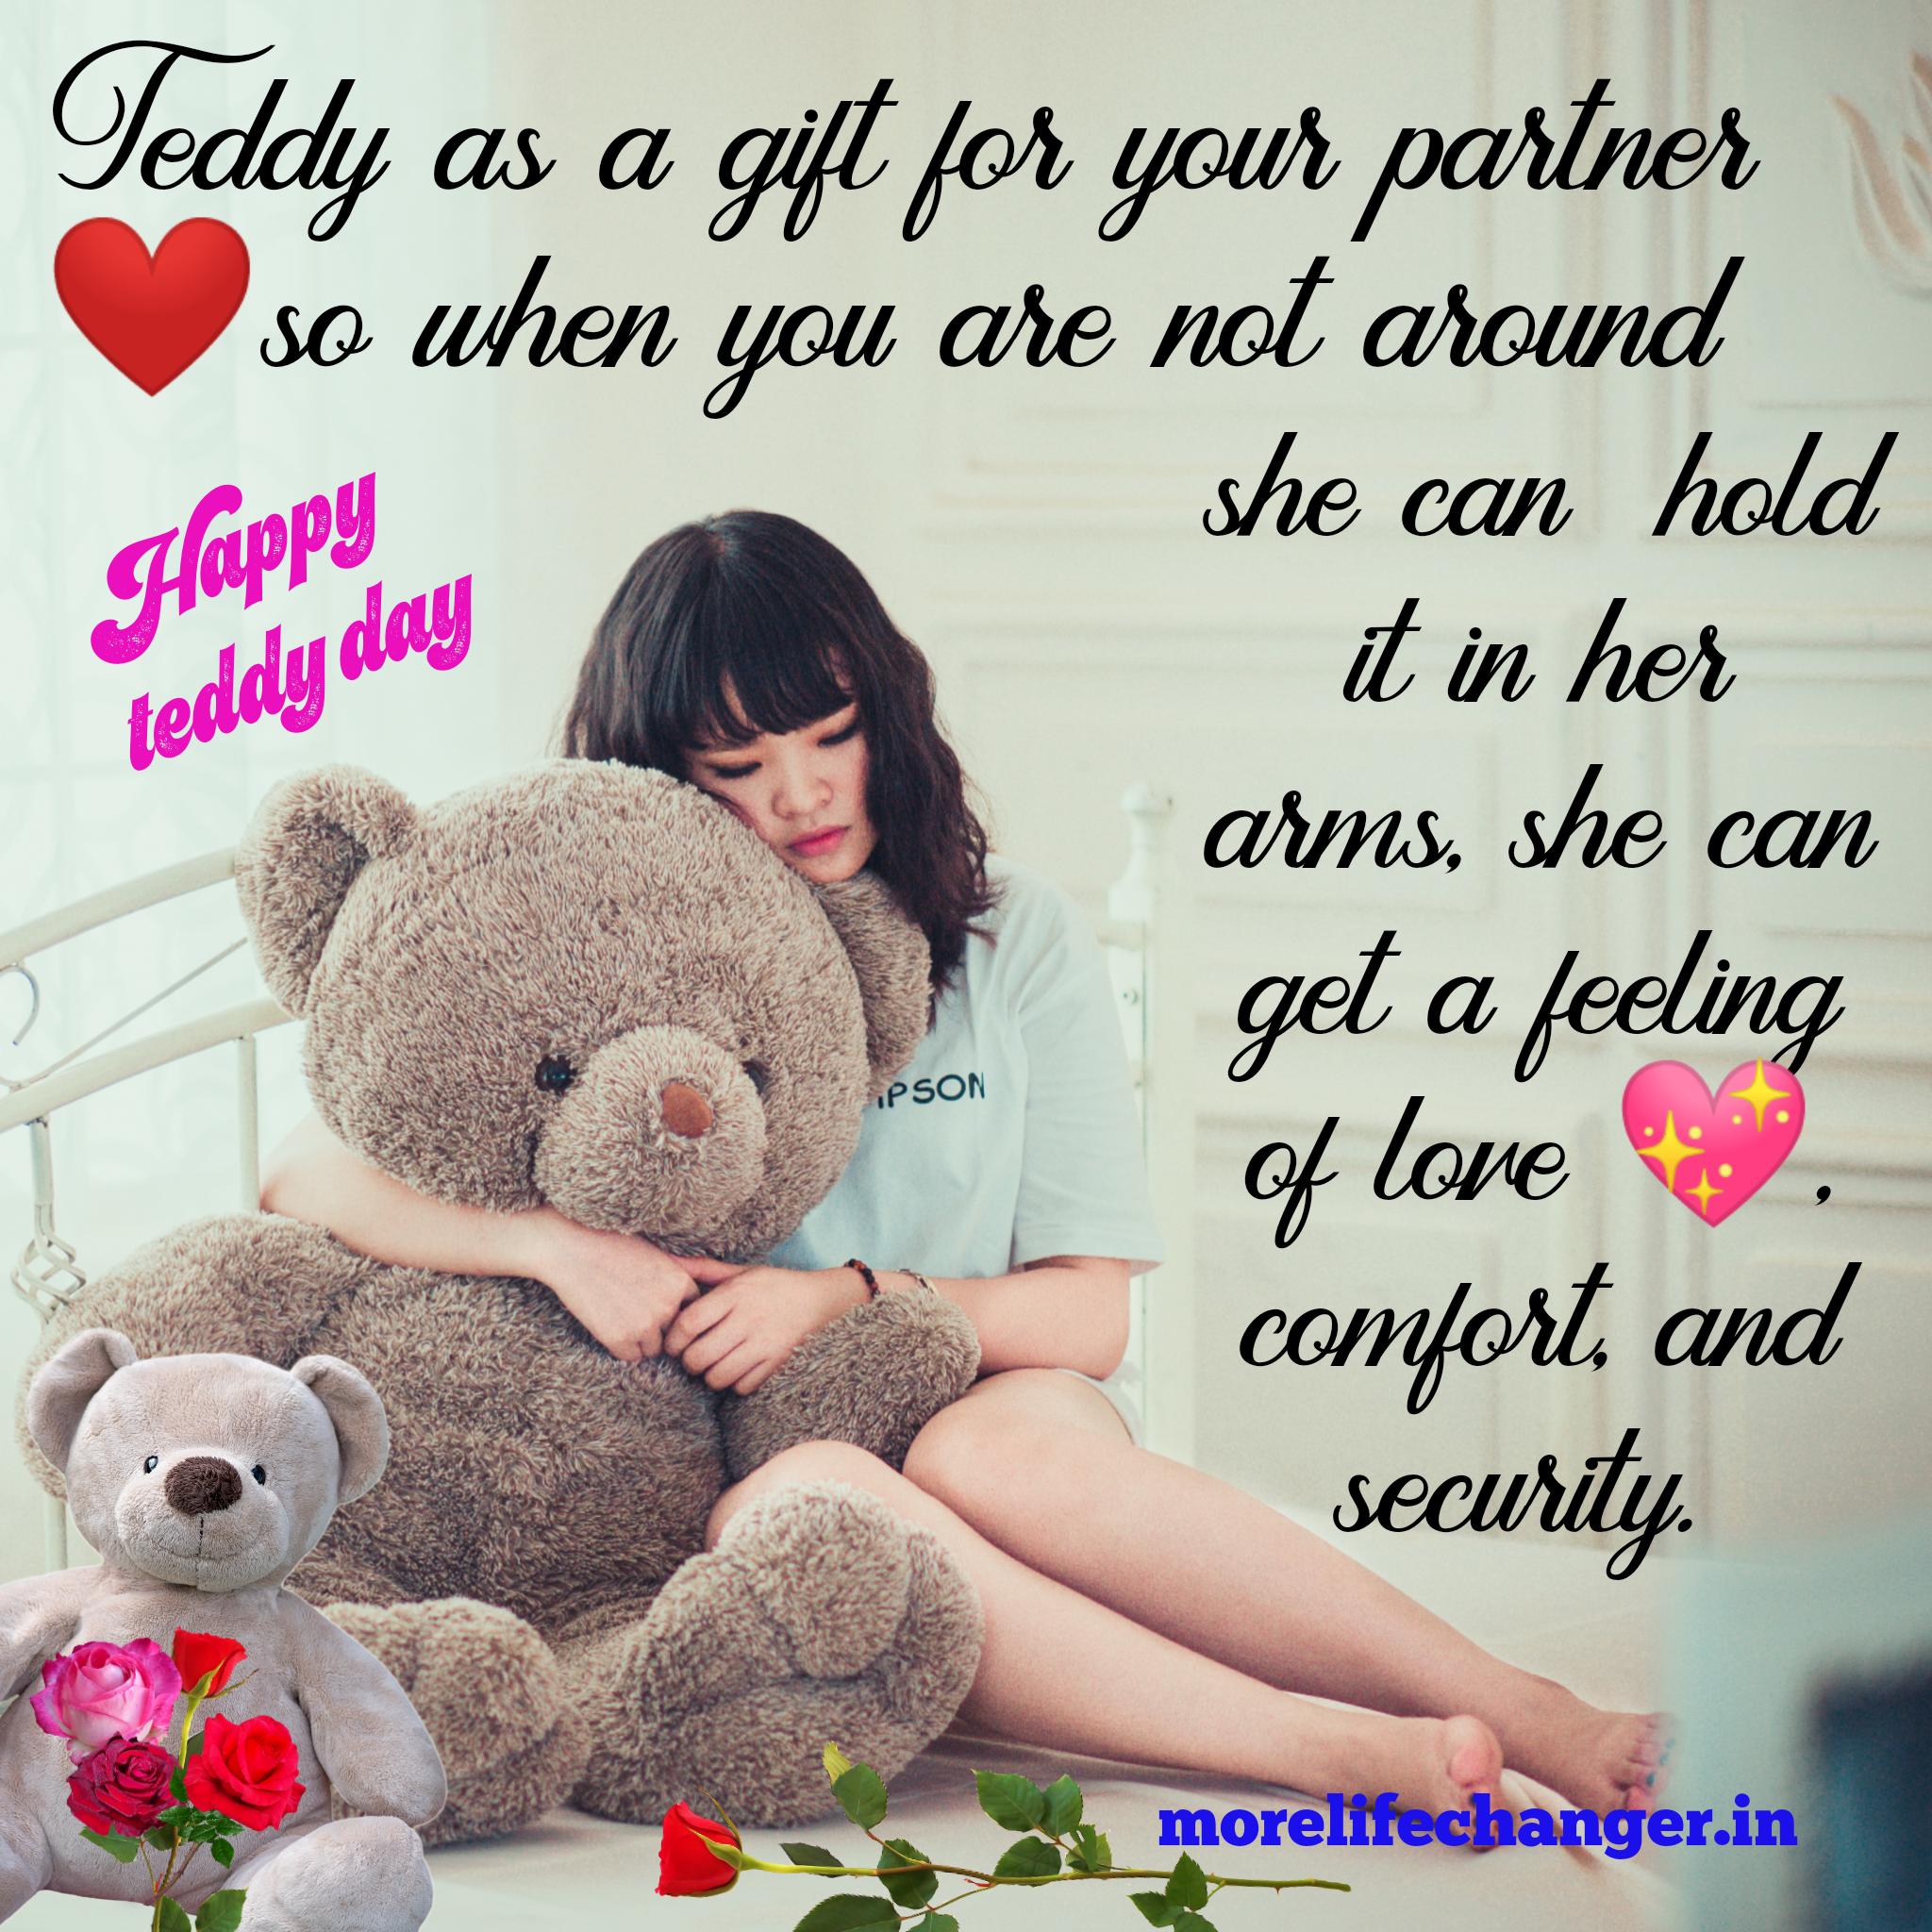 Happy Teddy Day quotes 1